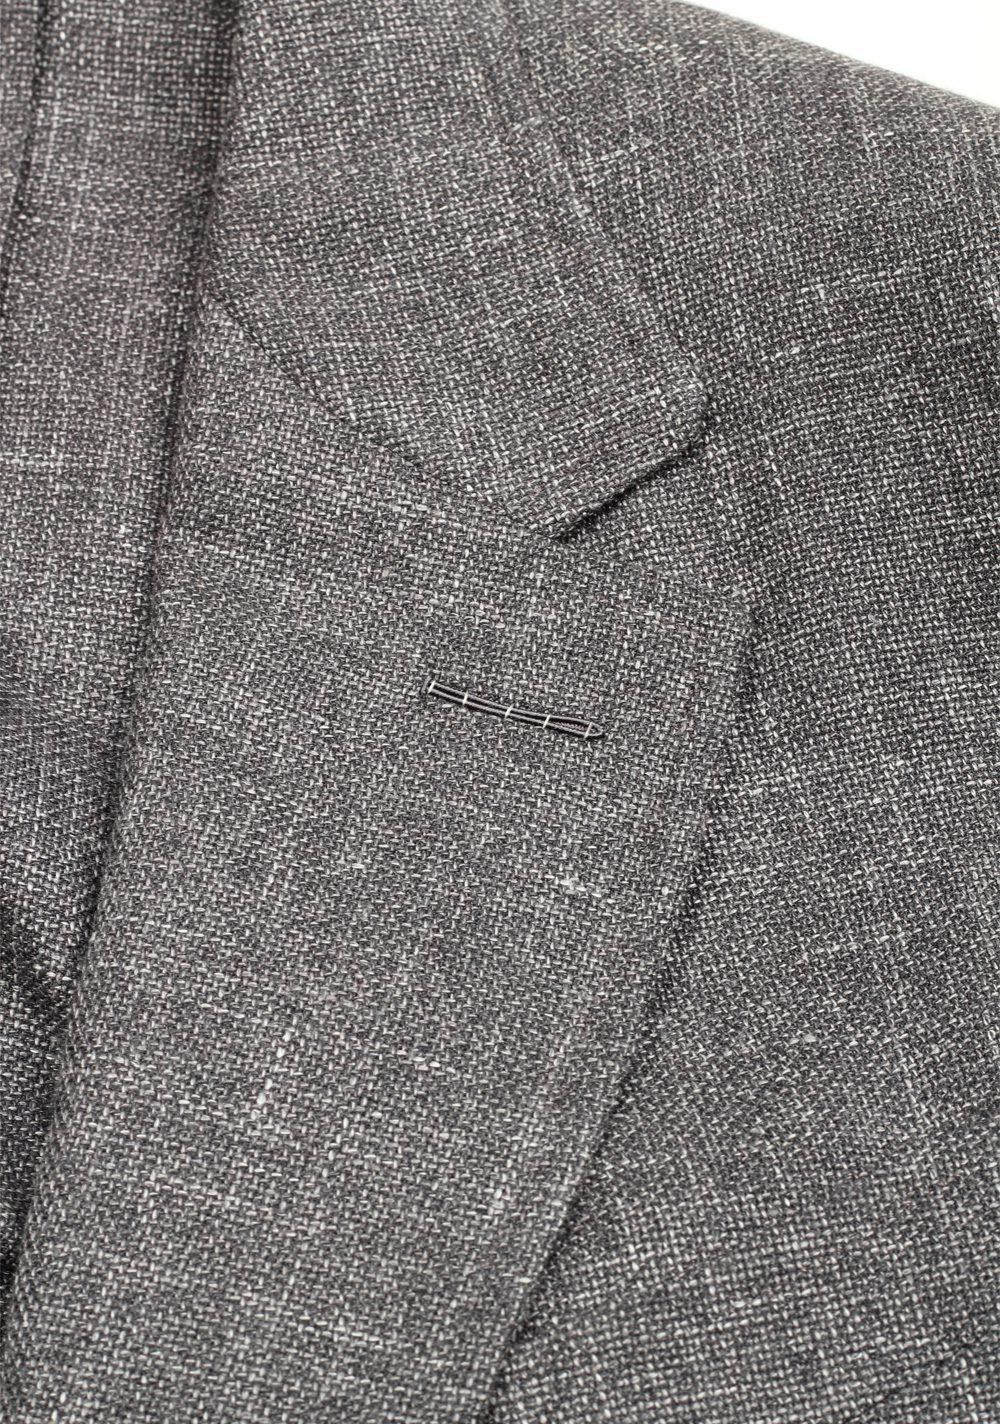 TOM FORD Shelton Gray Sport Coat Size 54 / 44R U.S. | Costume Limité